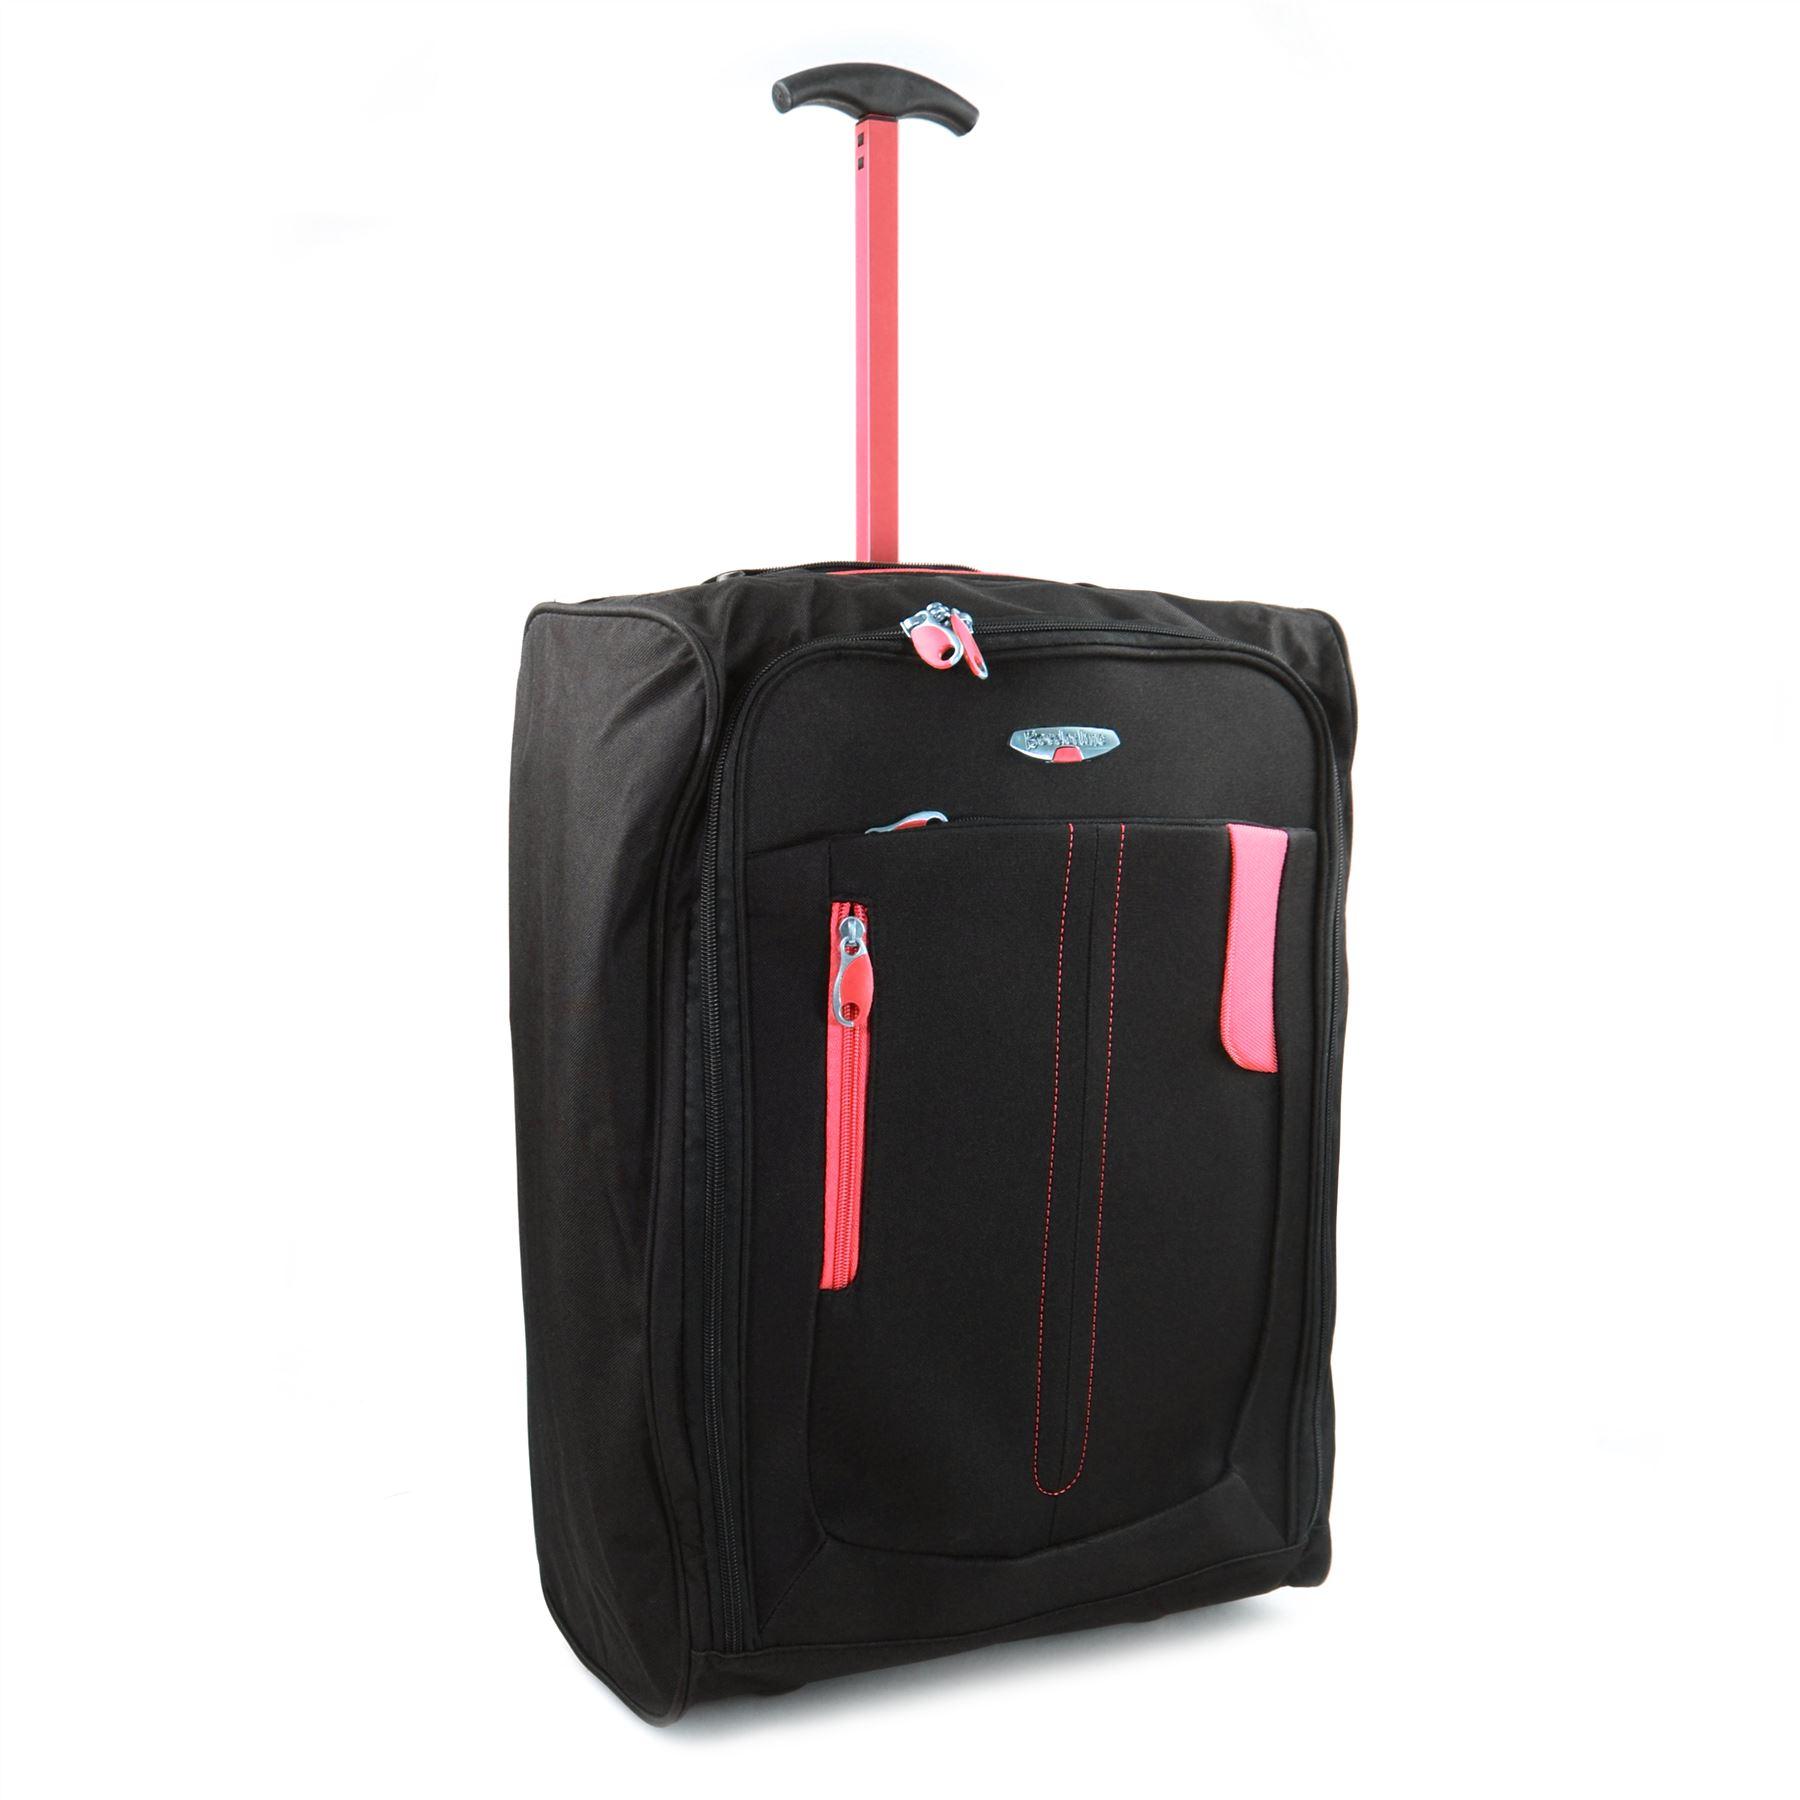 lightweight wheeled cabin hand luggage bag case trolly. Black Bedroom Furniture Sets. Home Design Ideas